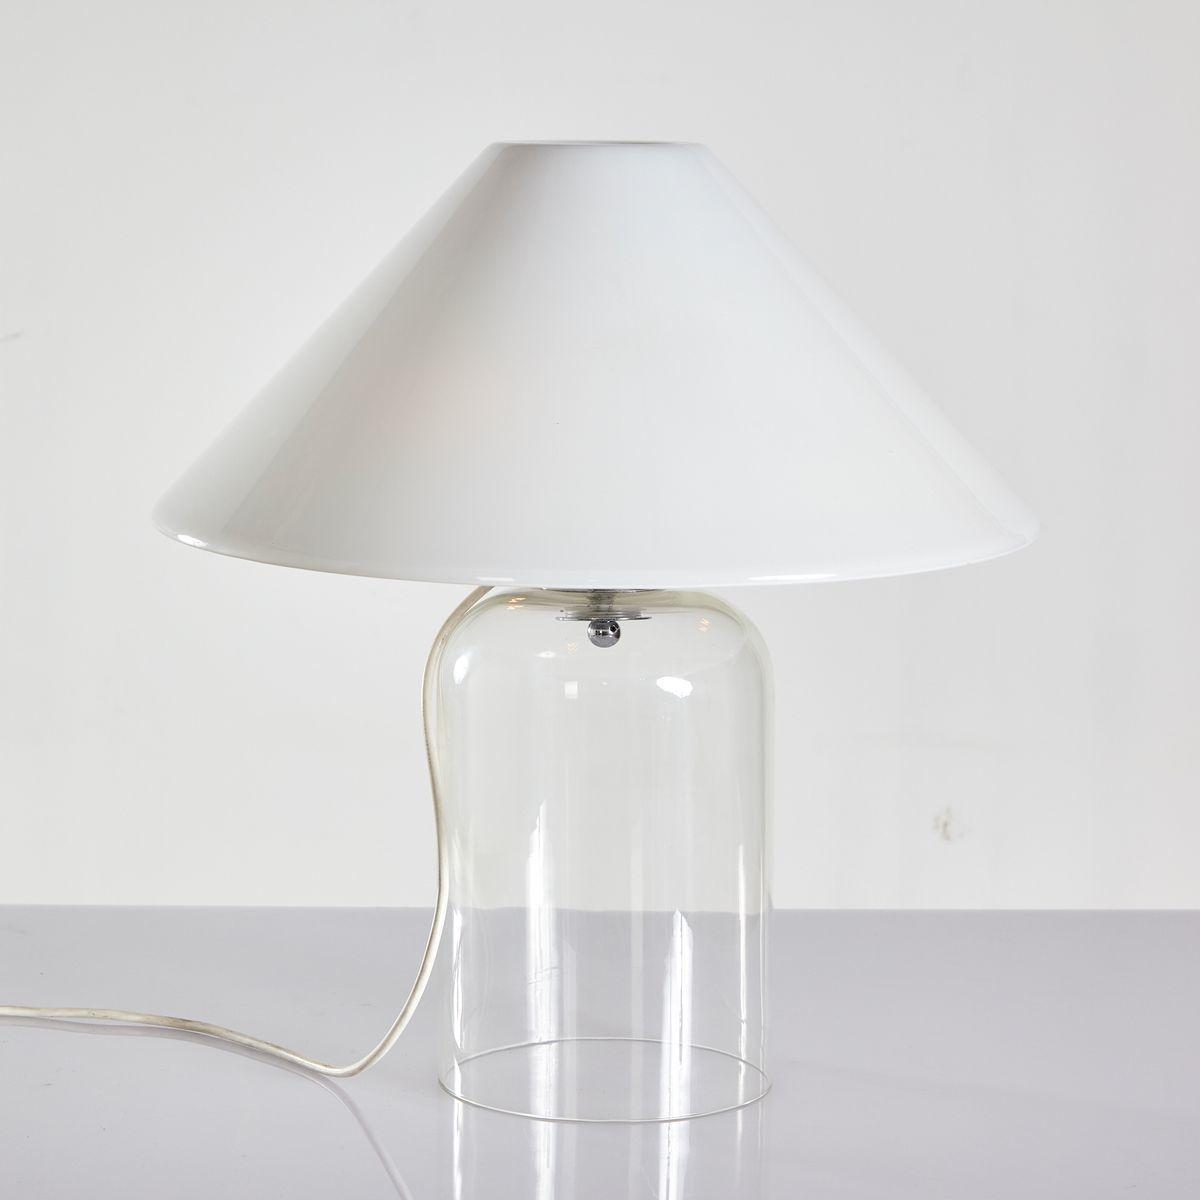 Alega Glass Table Lamp By Vico